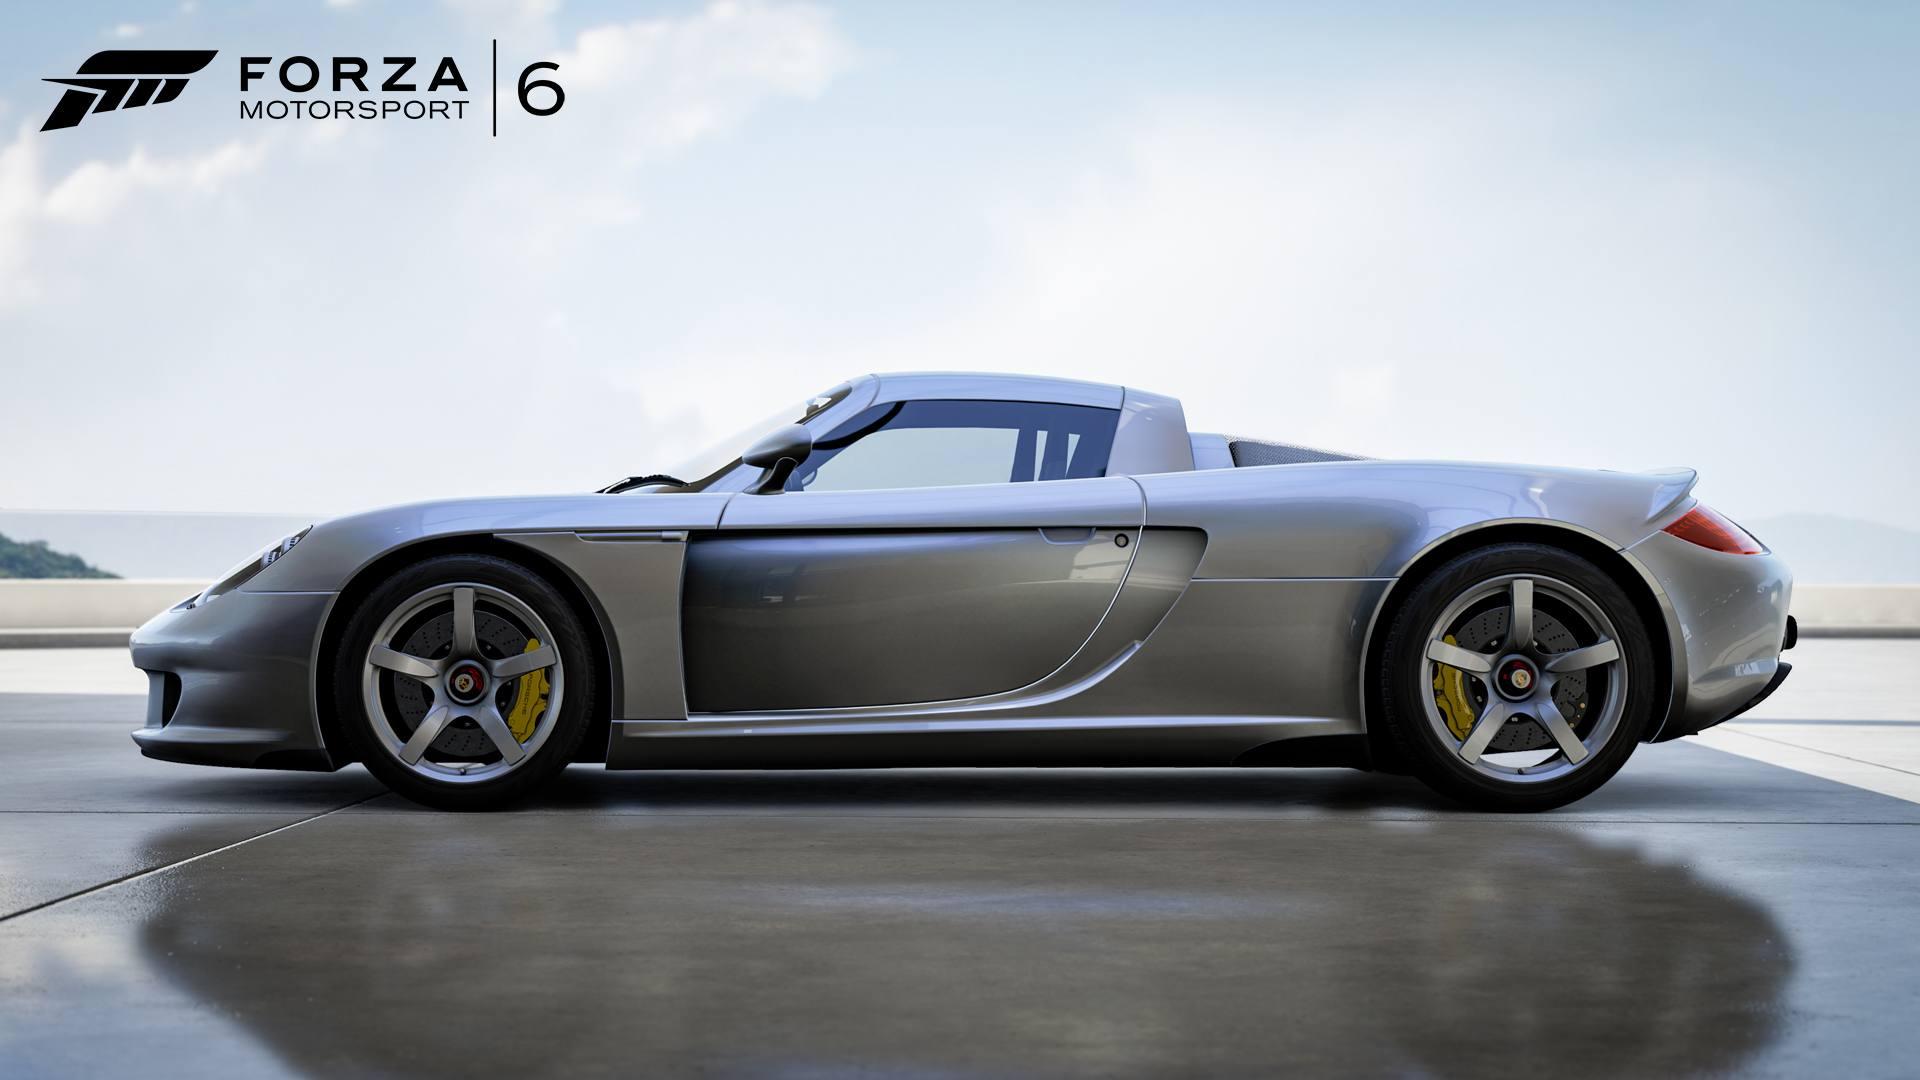 Forza Motorsport 6 01-03-16 2003 Porsche Carrera GT